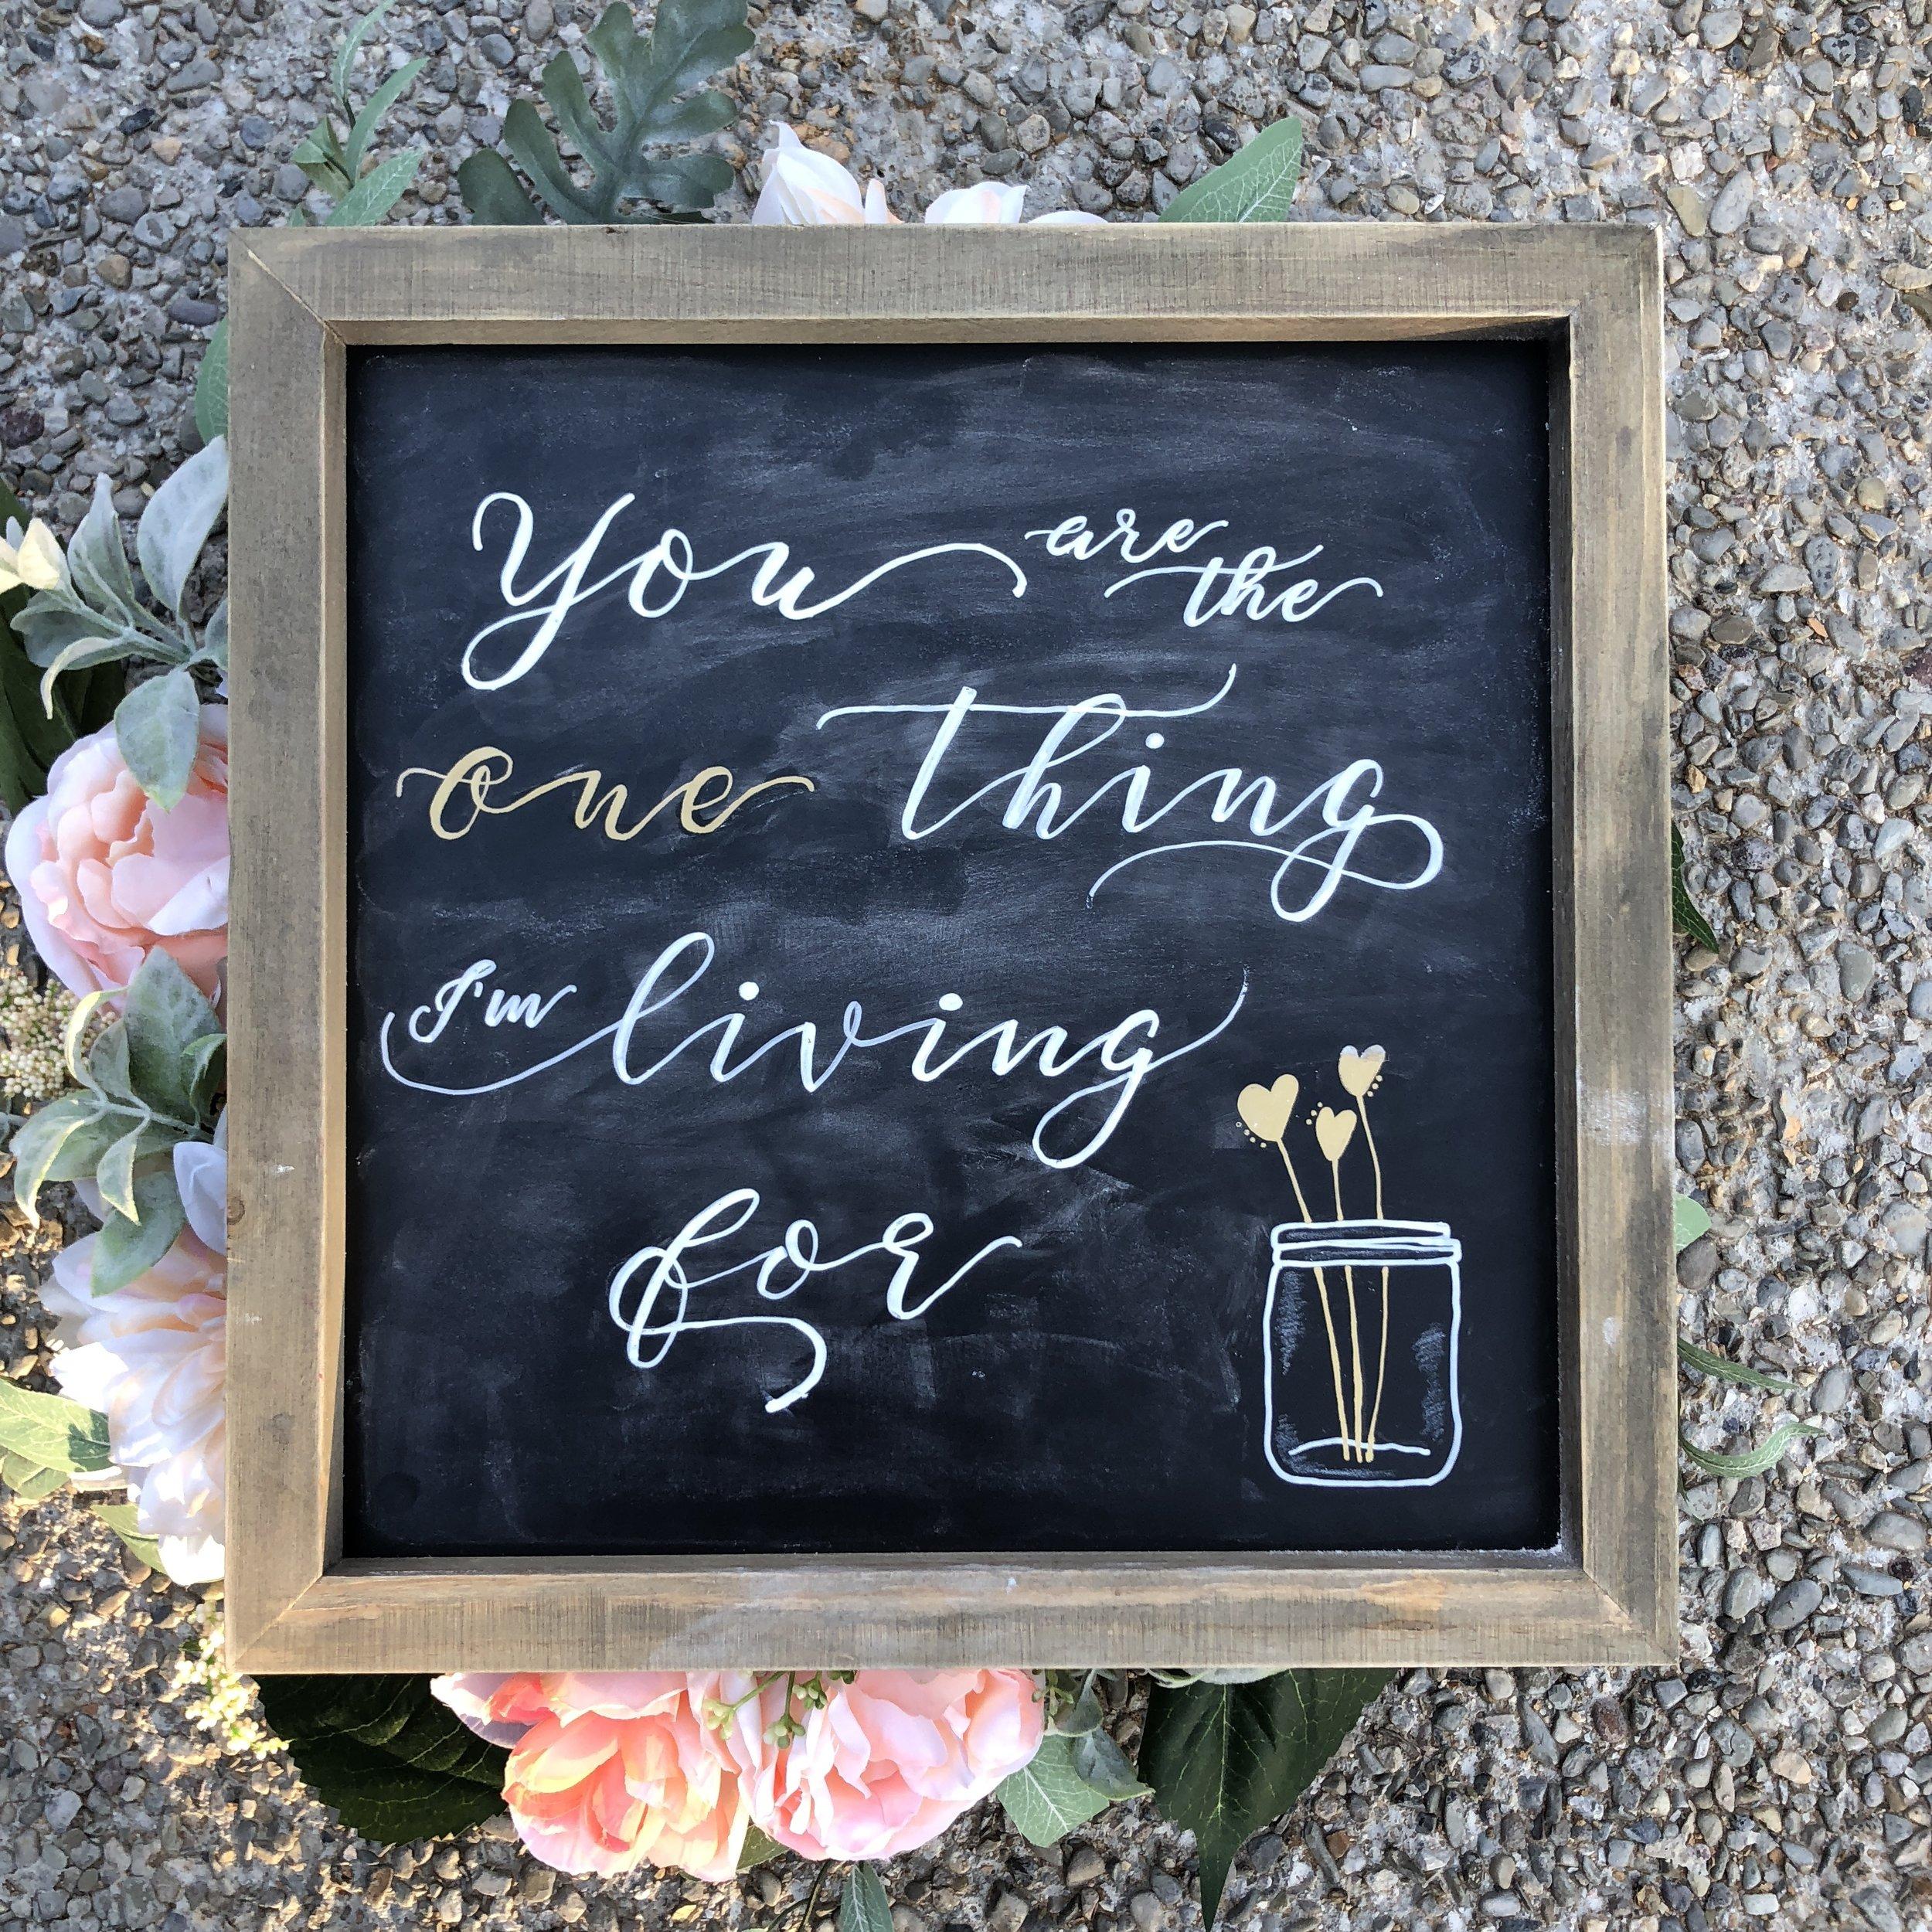 Central PA, York PA, JesSmith Designs, custom, wedding, invitations, bridal, announcements, save the date, baby, hanover, calligraphy, baltimore, wedding invitations, lancaster, gettysburg-04-22 07.25.45.jpg